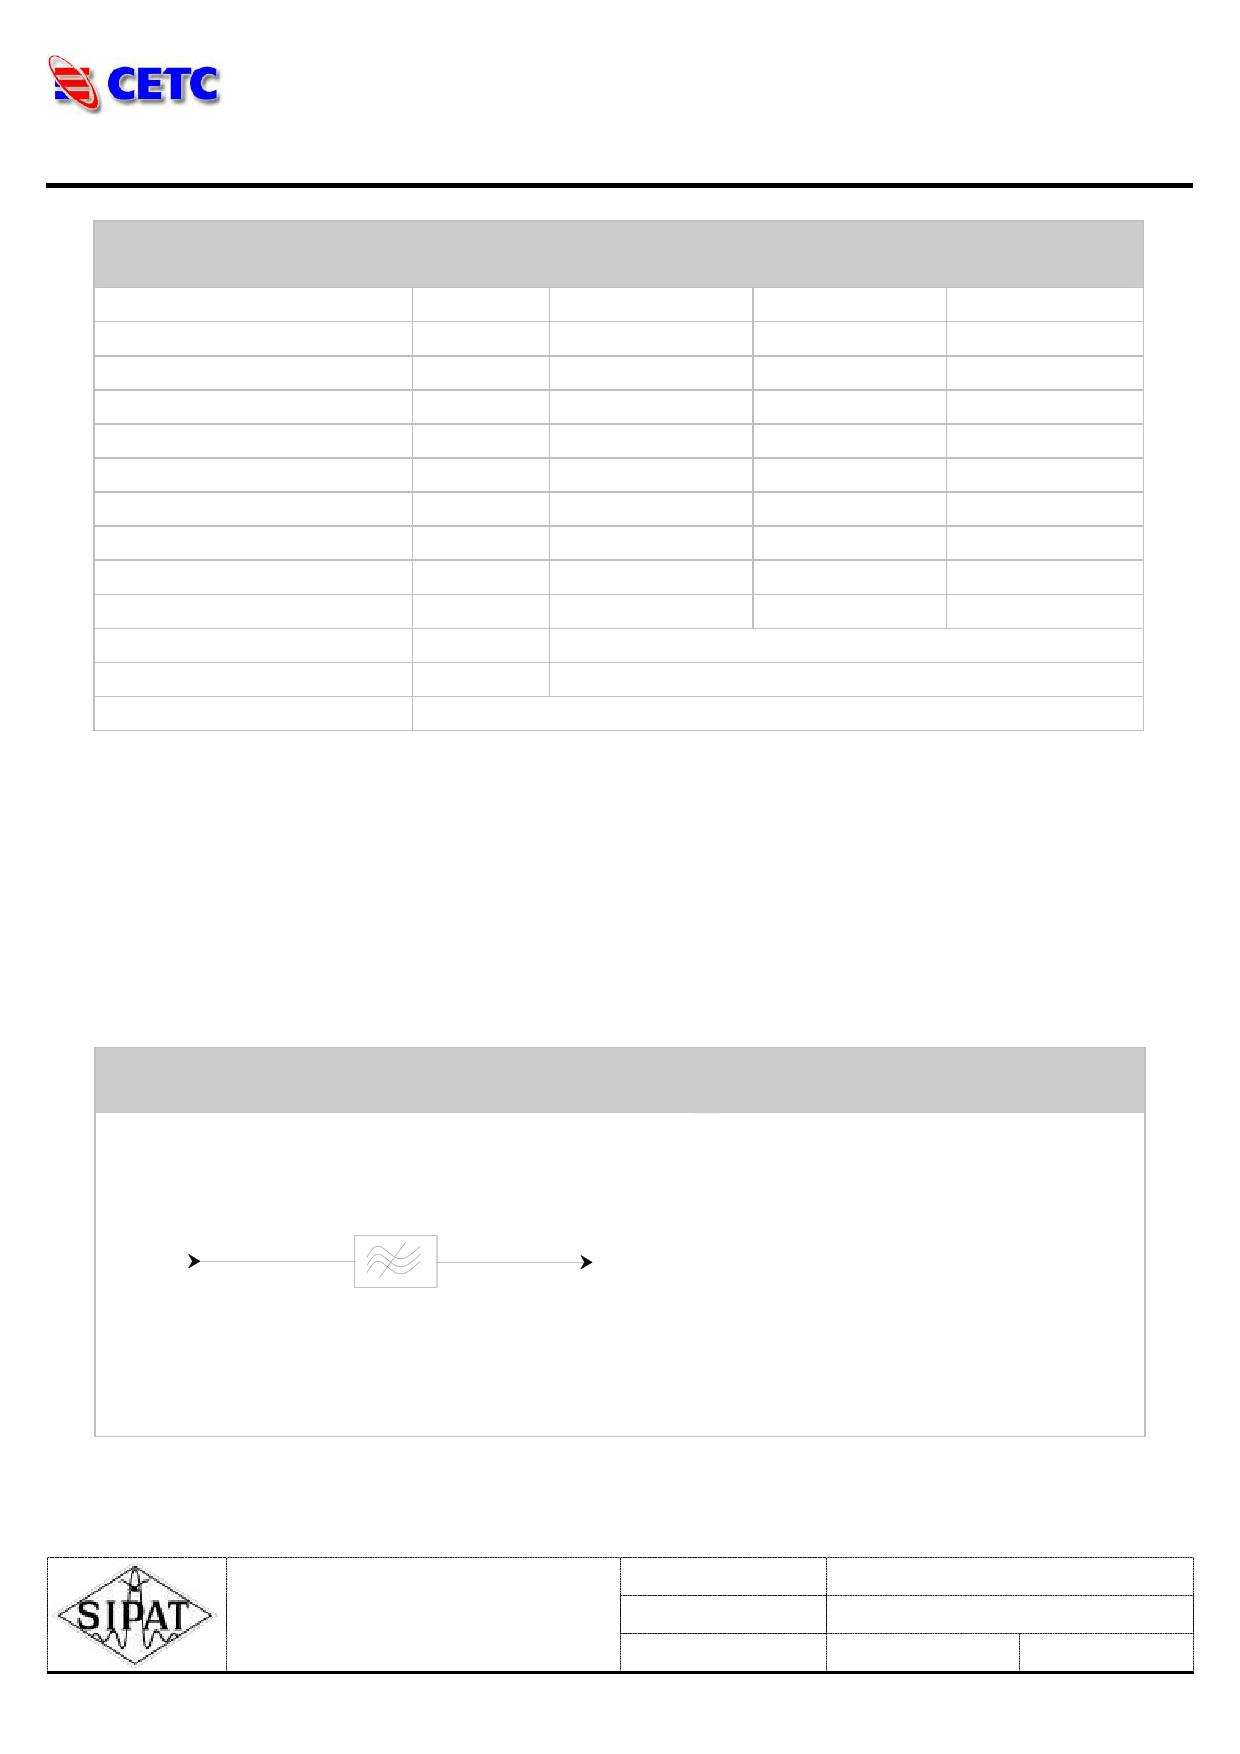 LBN70A30 datasheet